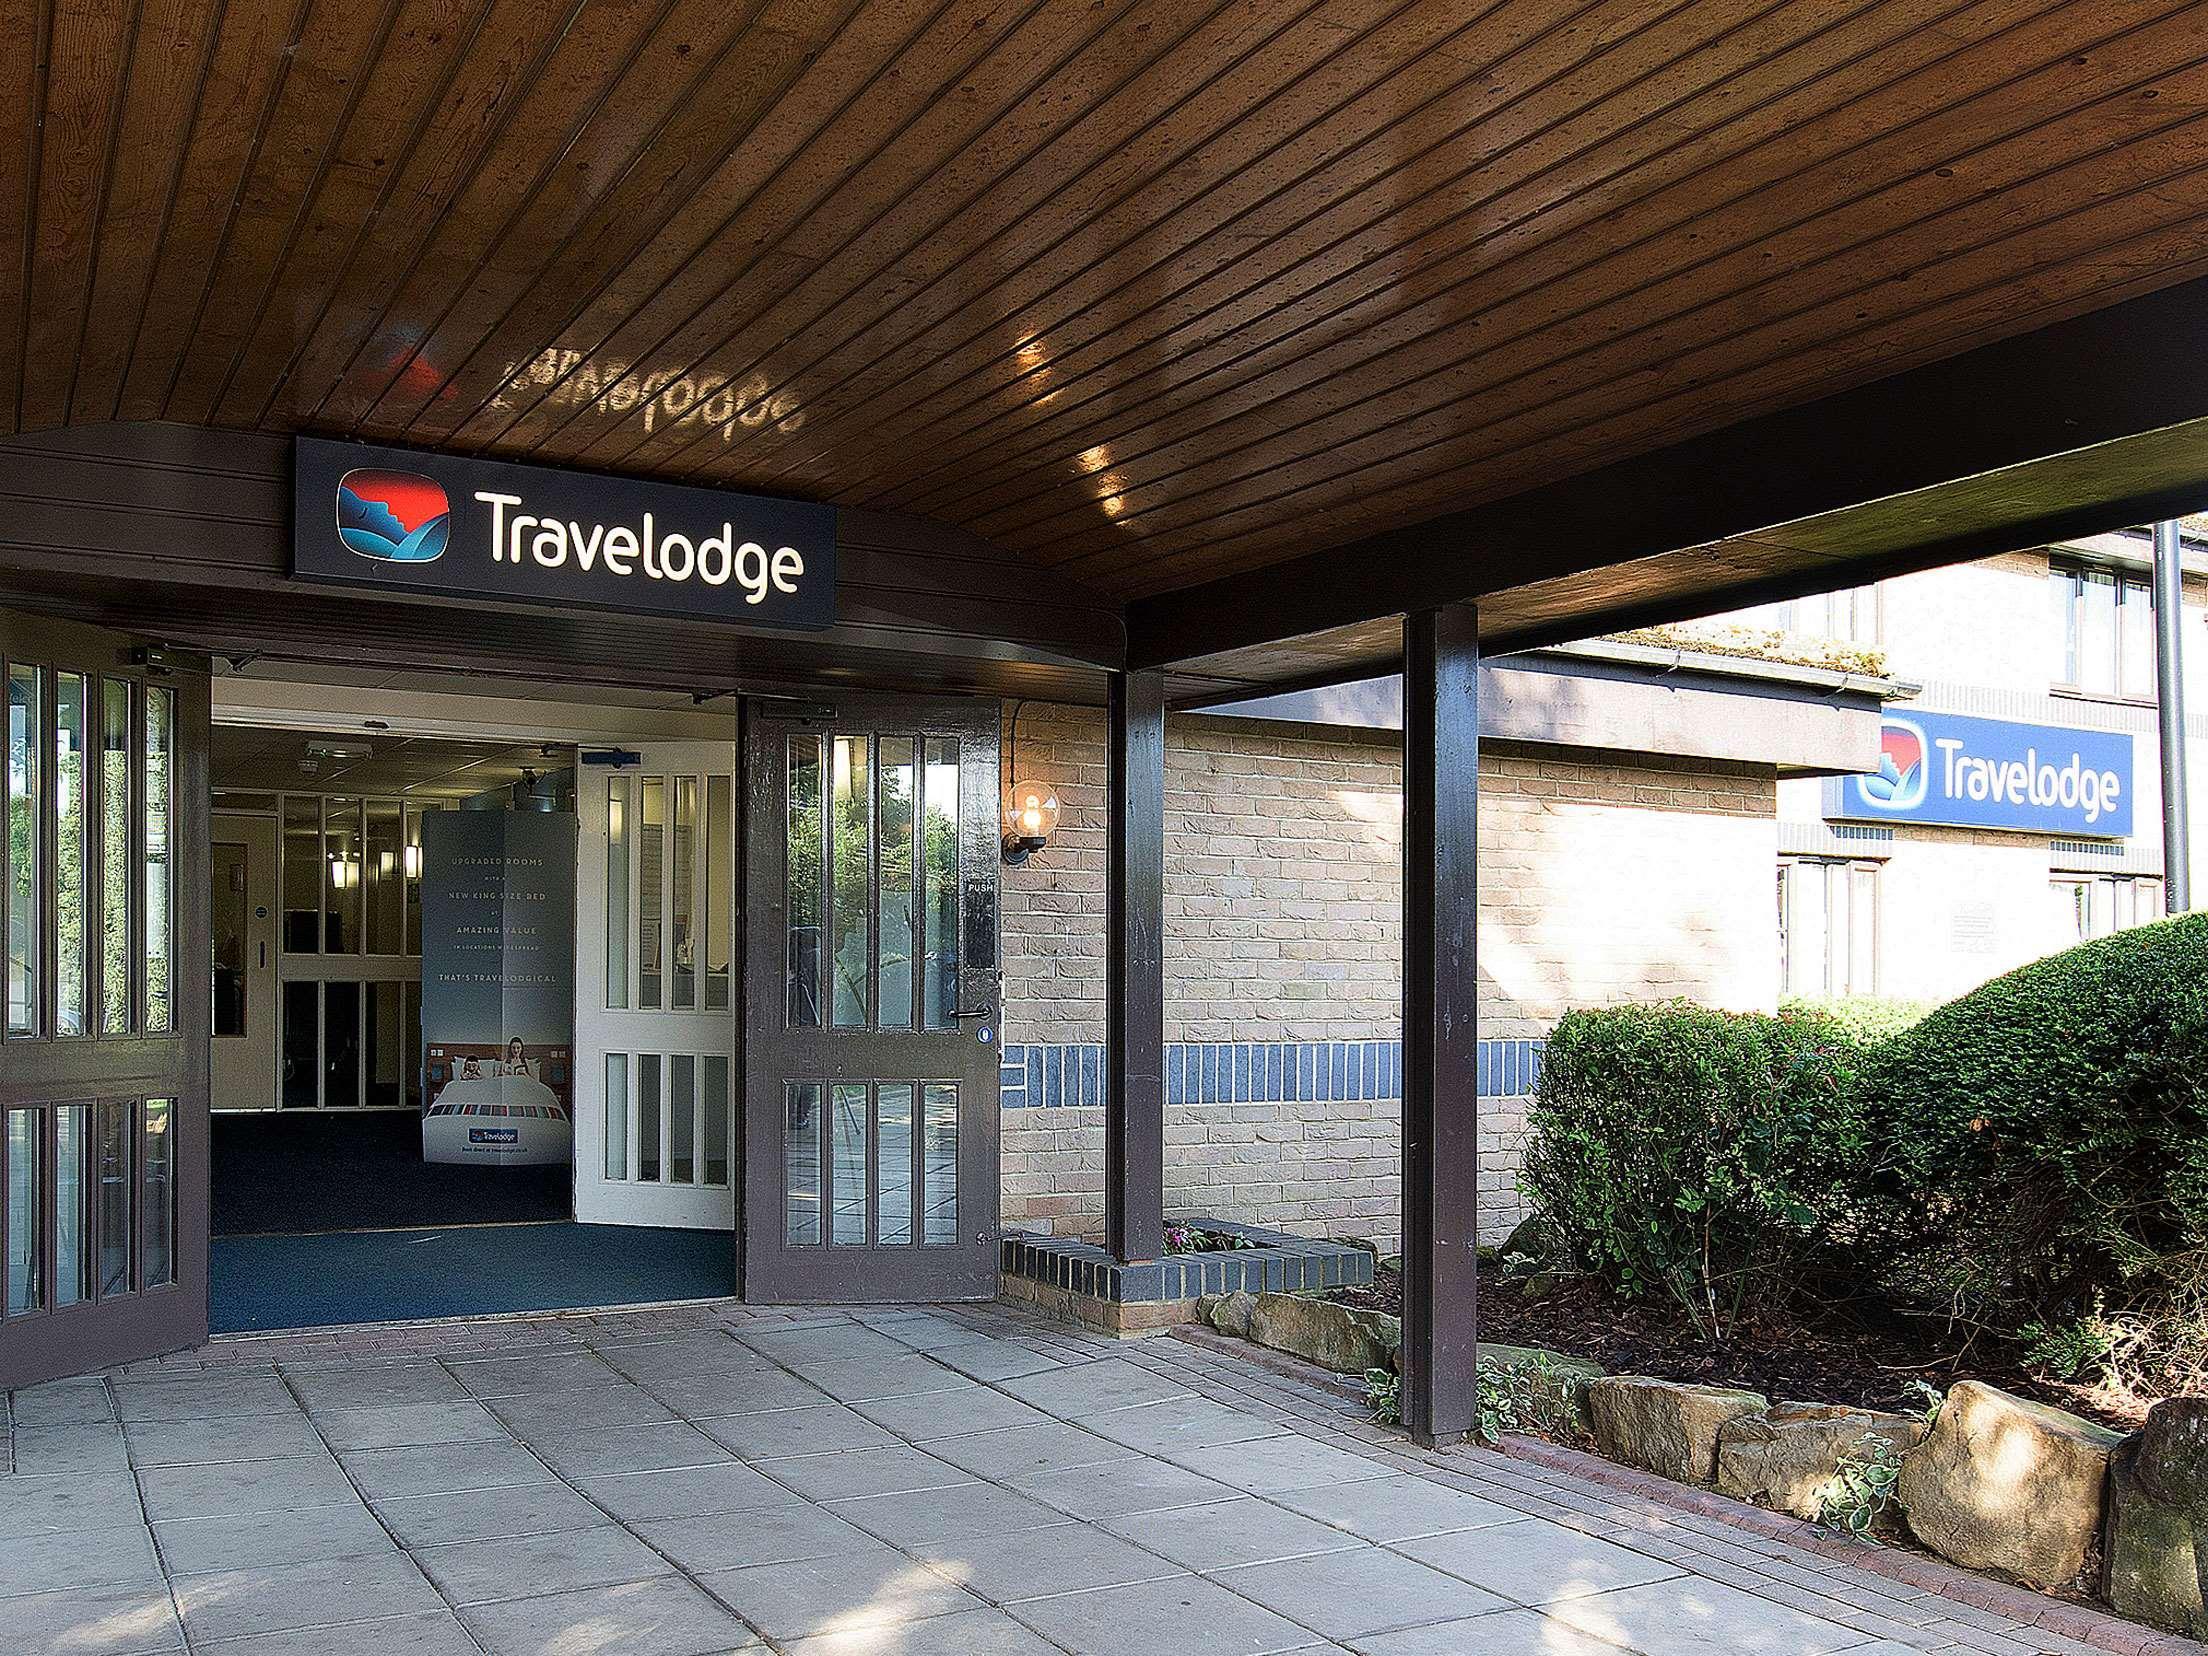 Travelodge Kettering Thrapston, Northamptonshire